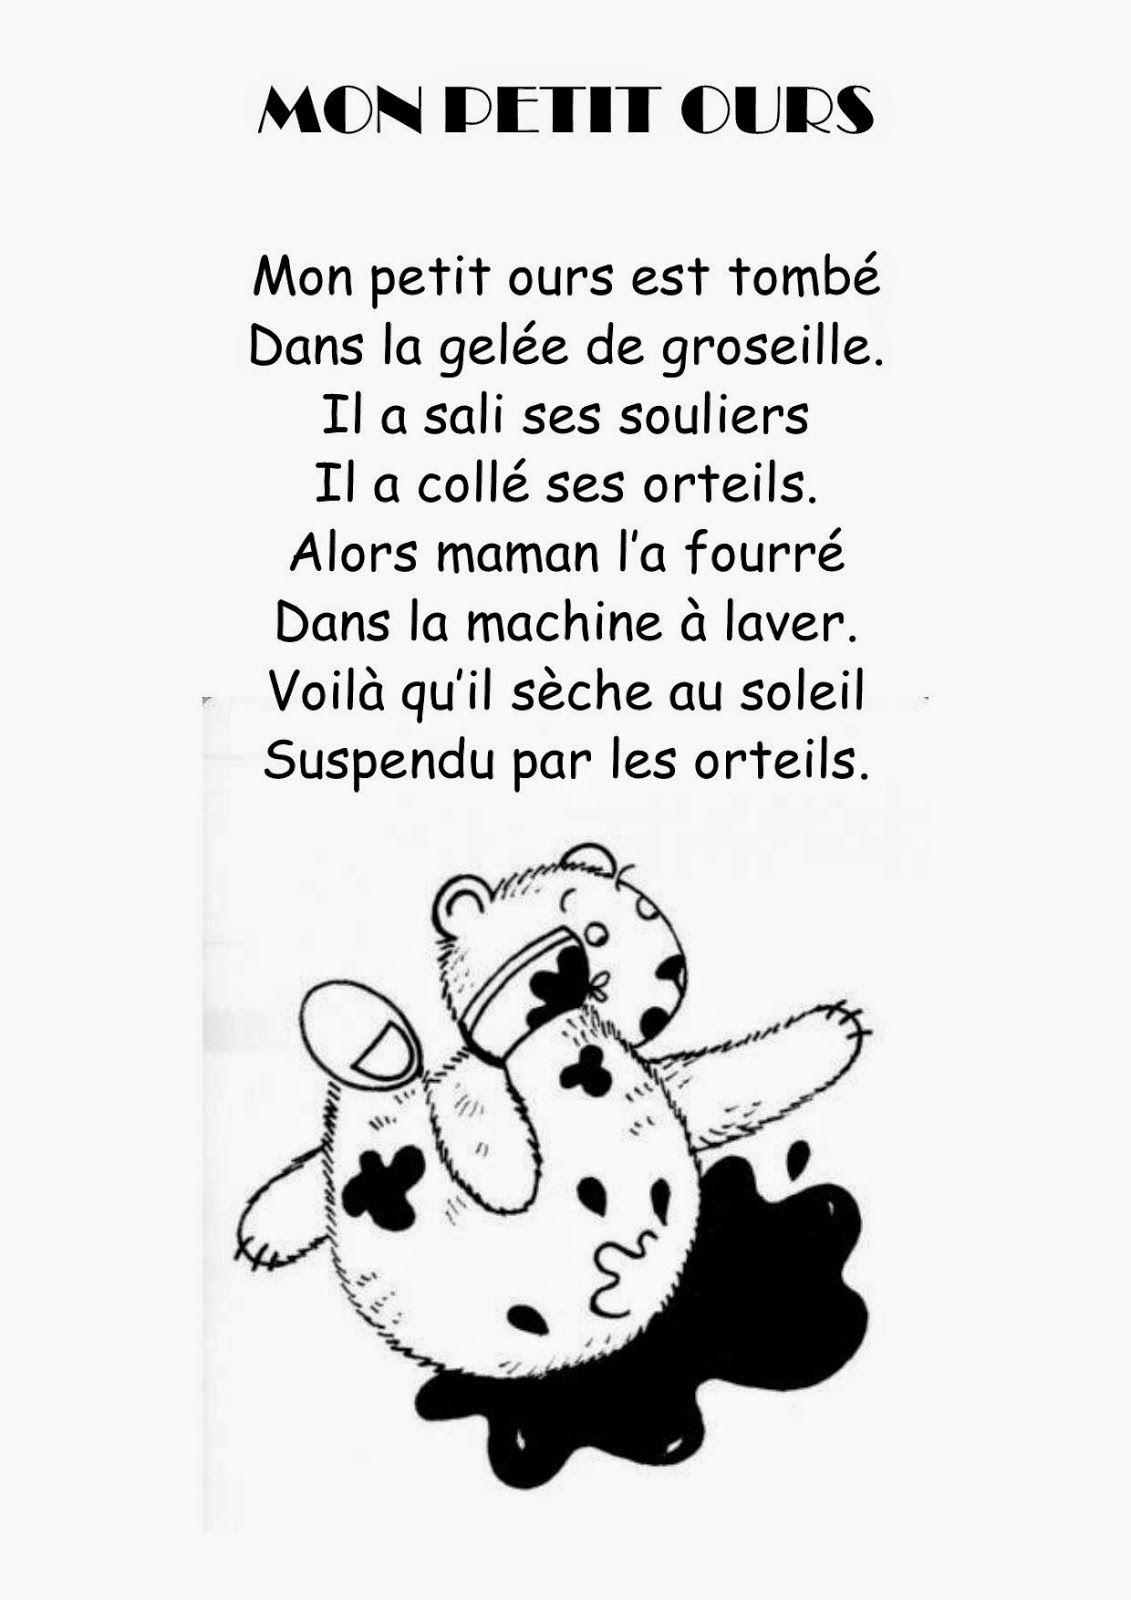 Comptine 21 mon petit ours boucle d 39 or french poems - Petit ours va a l ecole ...